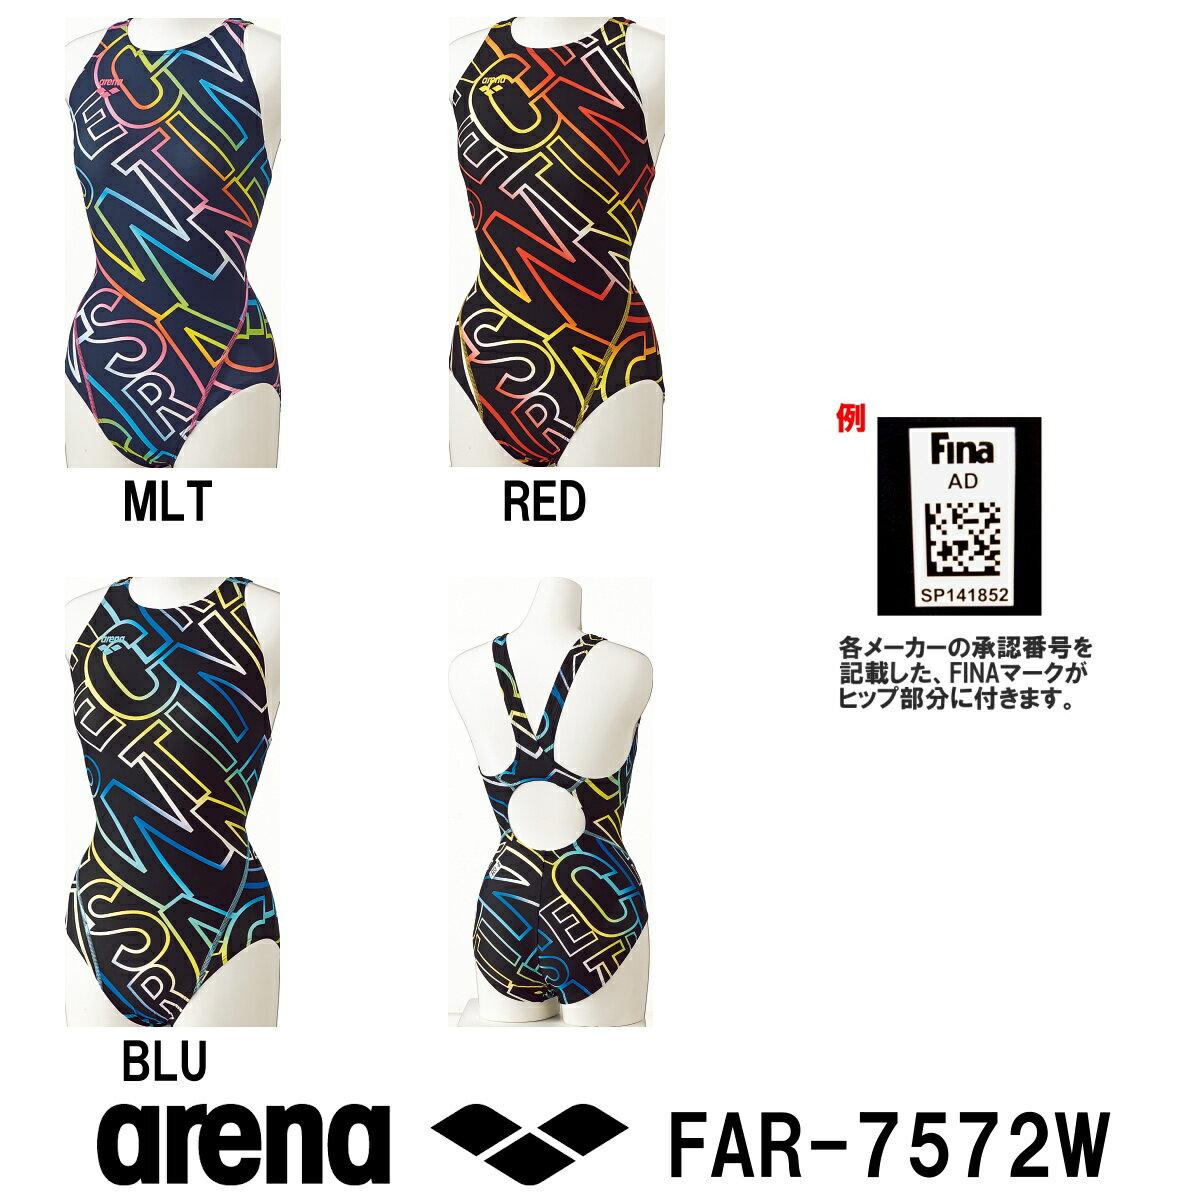 【FAR-7572W】ARENA(アリーナ) レディース競泳水着  UROKO SKIN セーフリーバック(着やストラップ)[競泳水着/女性用/ワンピース/FINA承認]